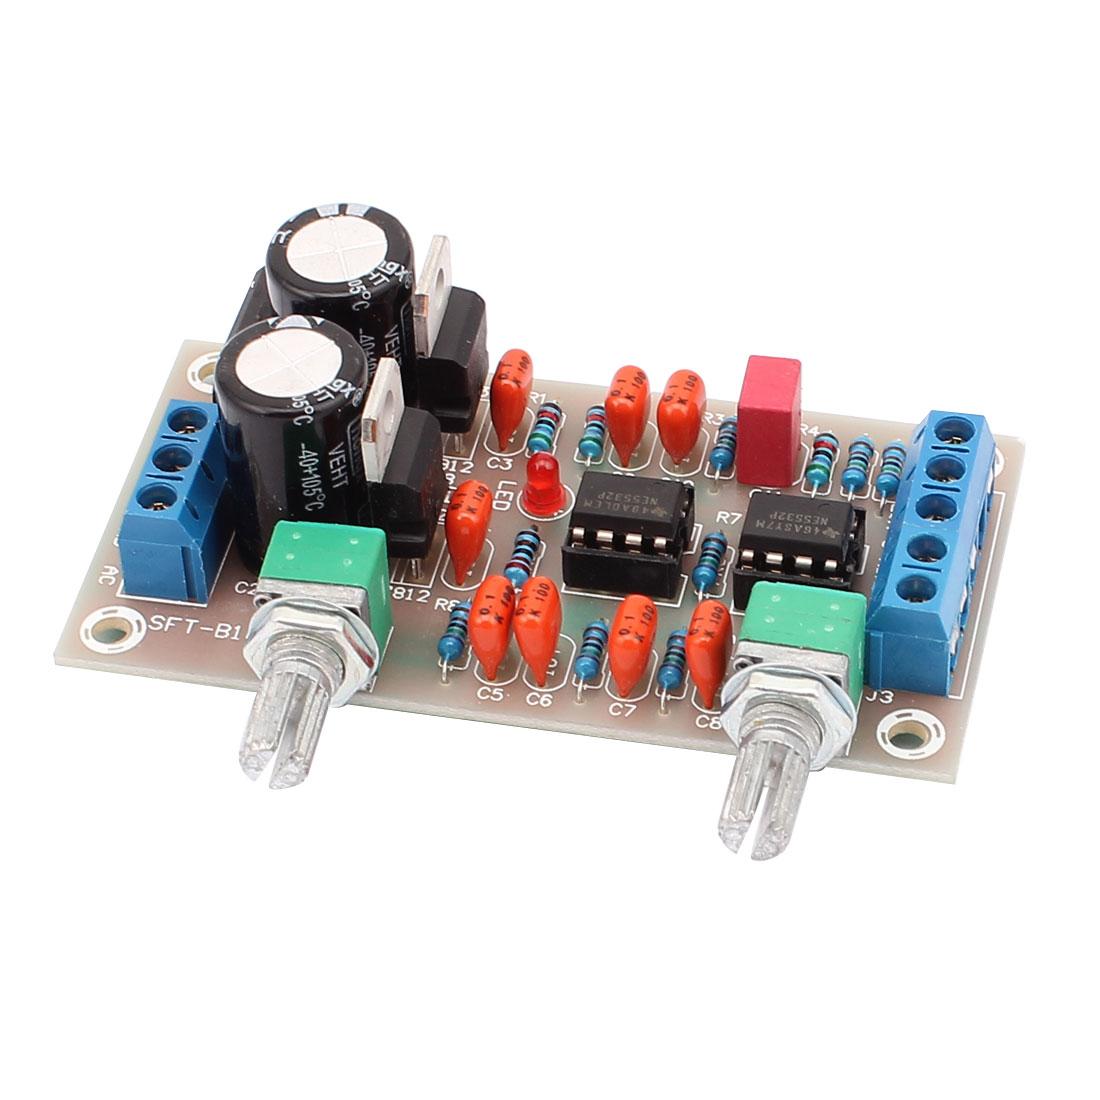 AC12-18V Subwoofer Audio Hi-Fi Car Boat Stereo Power Amplifier Board